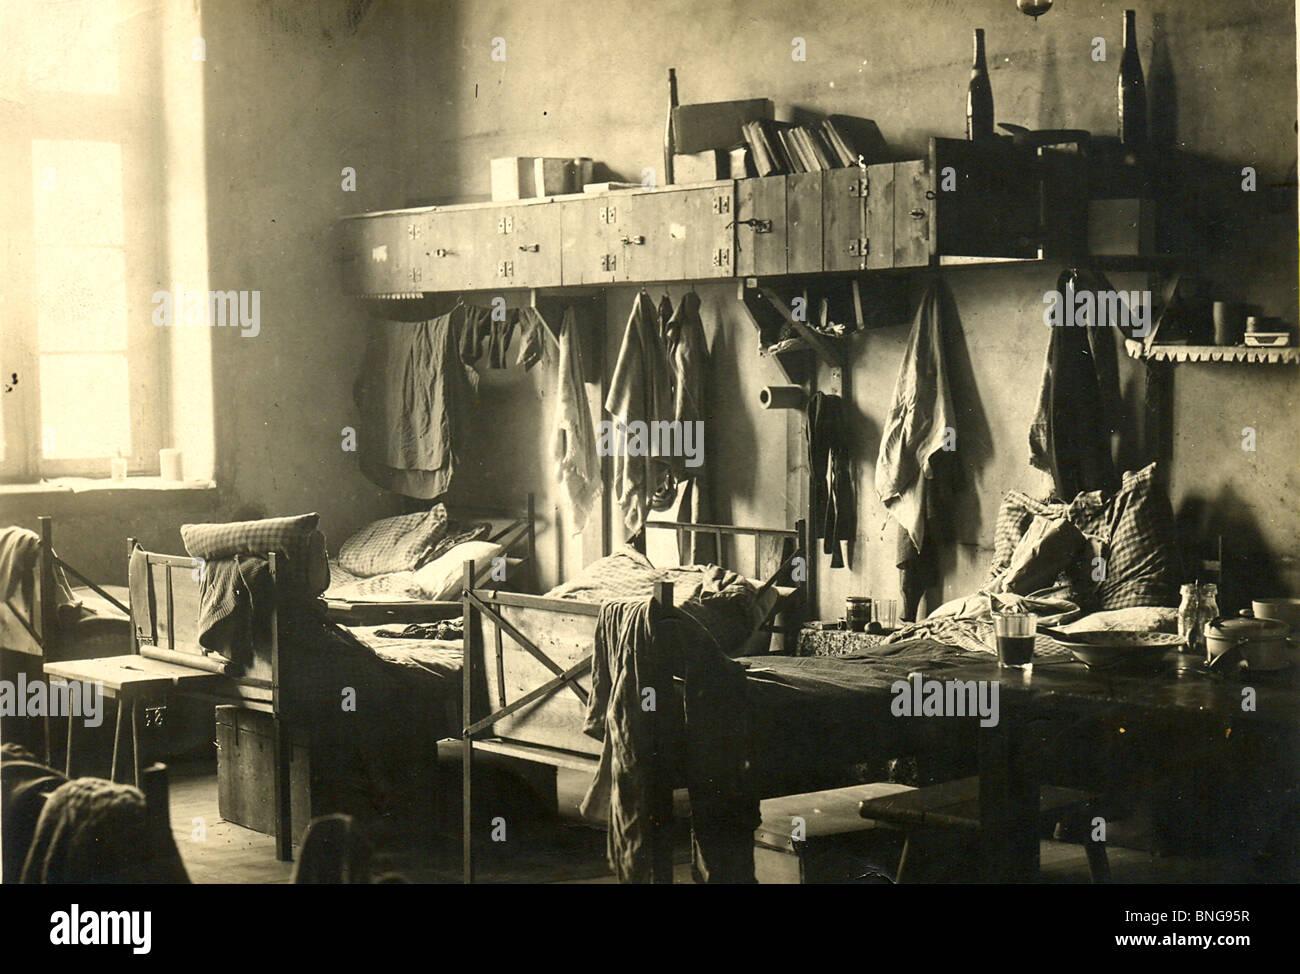 Bed And Living Room For Officers At WW Prisoner Of War Camp Stock - Living room war